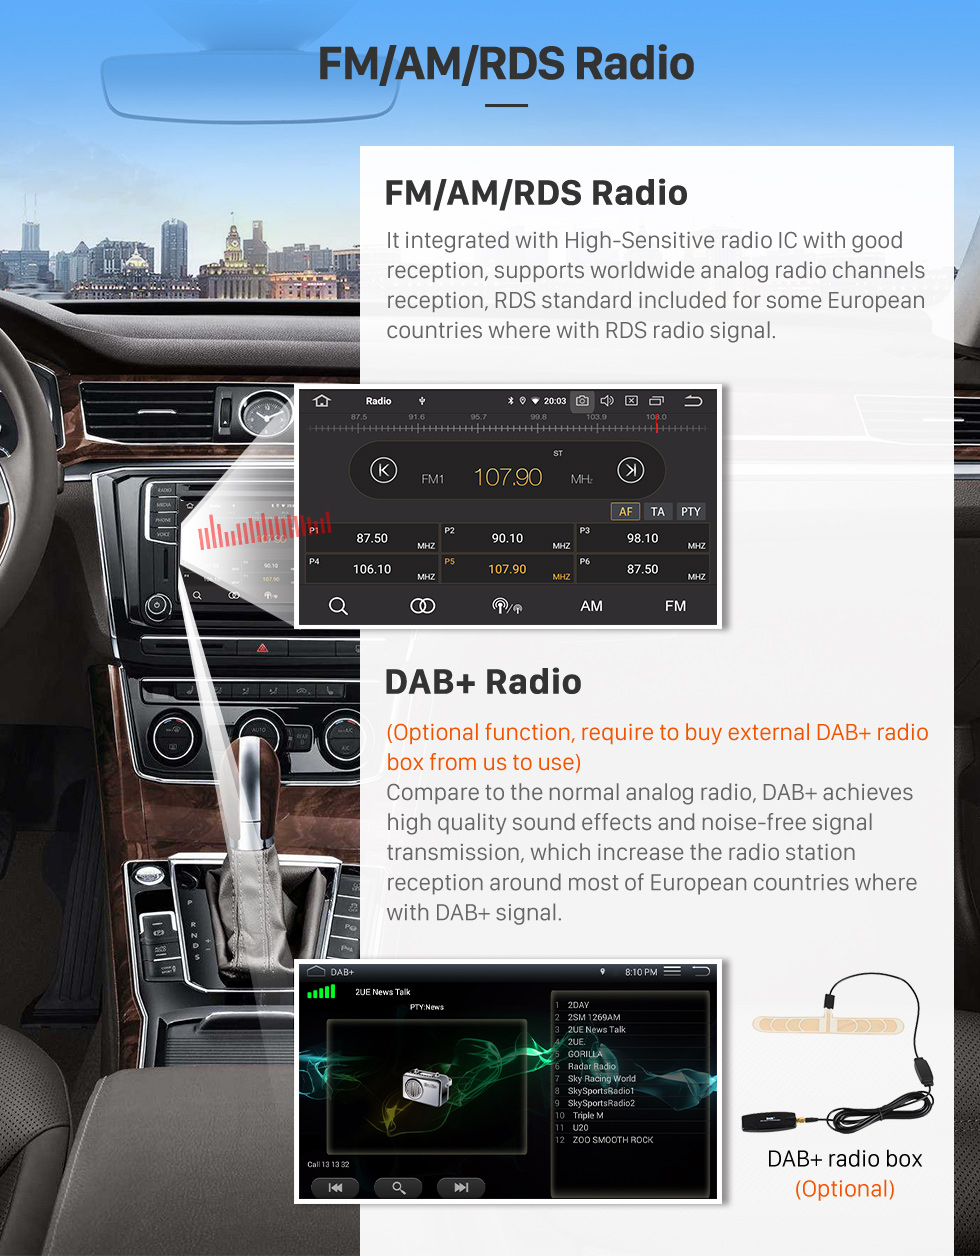 Seicane 7 inch 2004-2012 Opel Zafira/Vectra/Antara/Astra/Corsa Android 9.0 GPS Navigation Radio Bluetooth HD Touchscreen WIFI Carplay support DAB+ OBD